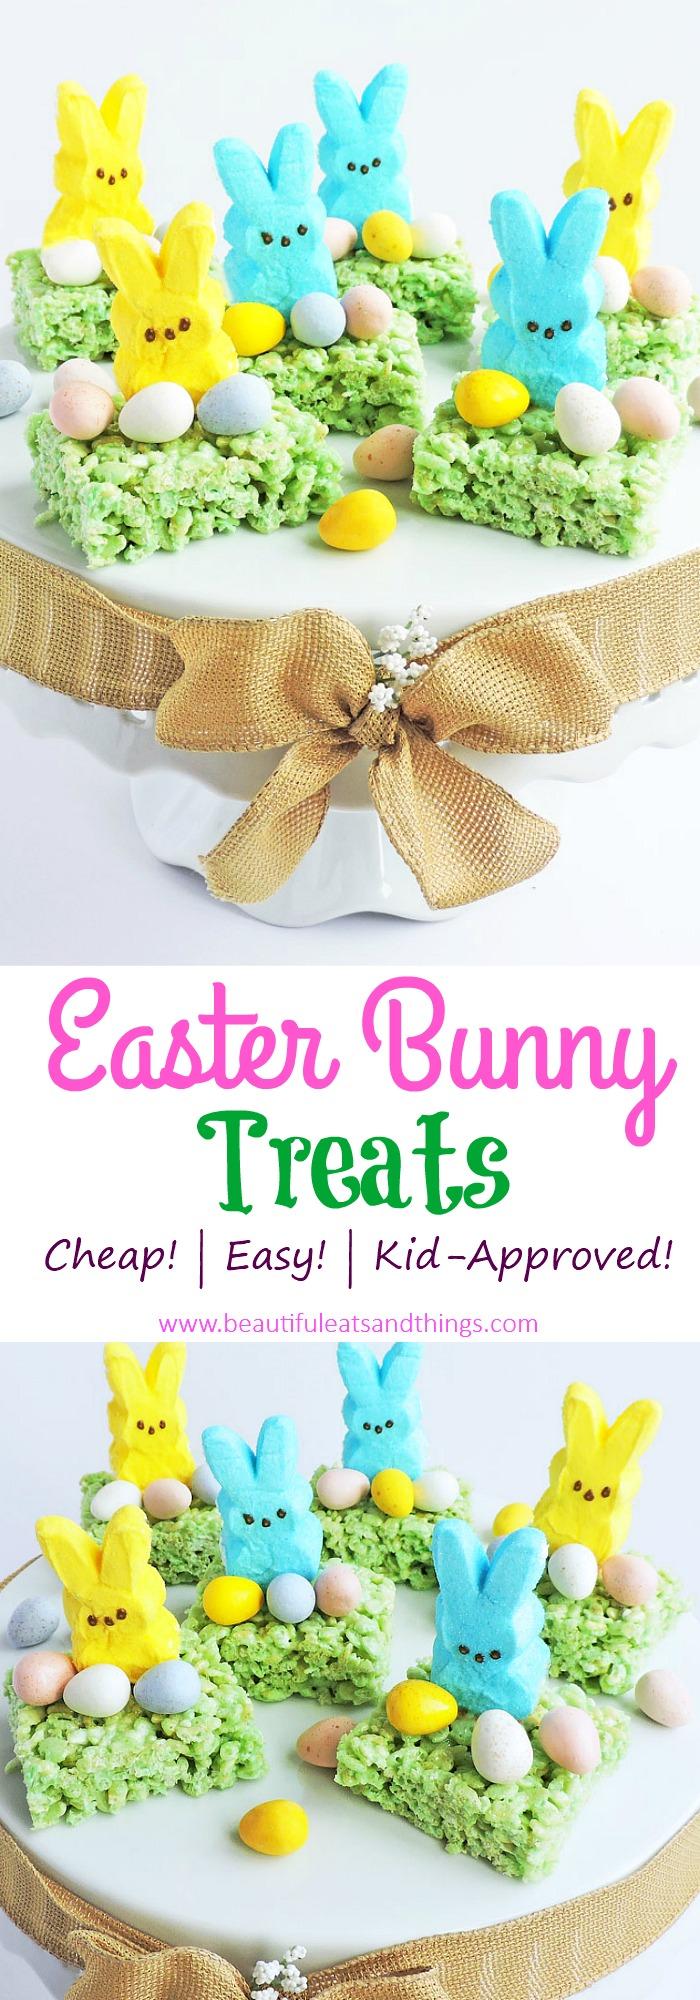 Easy Easter Bunny Treats-Cute Ideas for Easter Treats